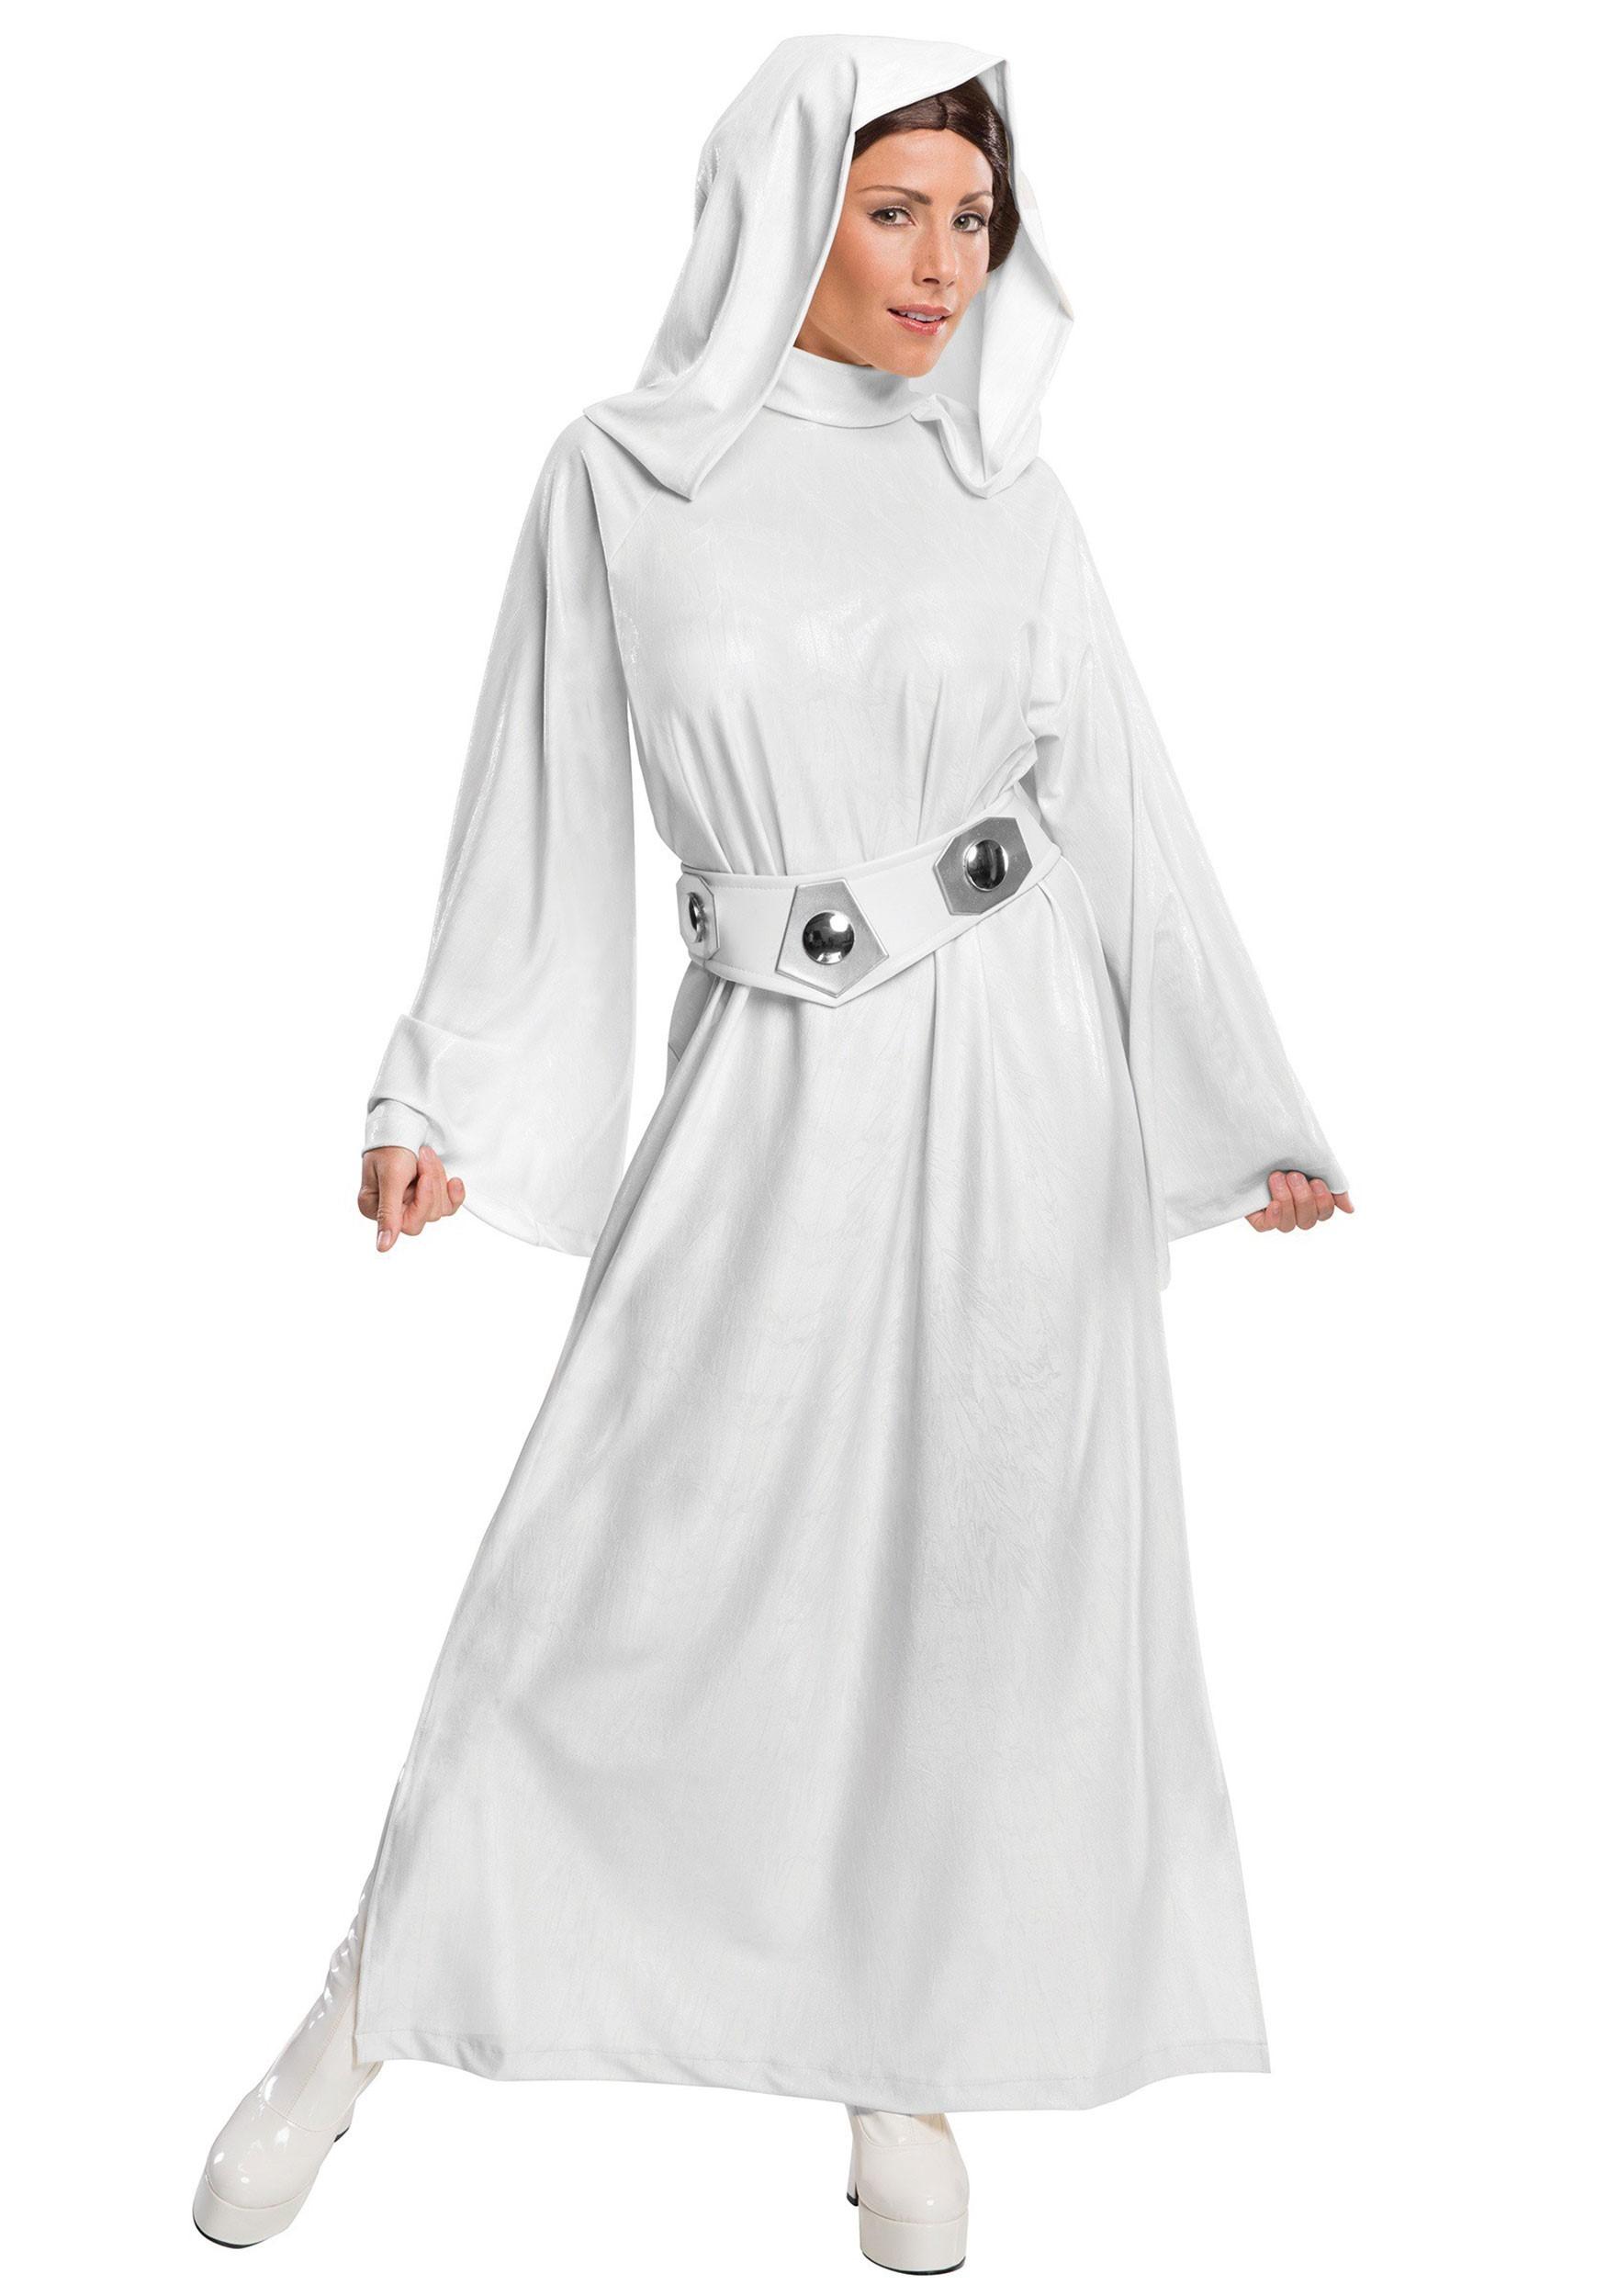 Deluxe Adult Princess Leia Costume  sc 1 st  Halloween Costumes UK & Star Wars Costumes - Adult Child Kids Halloween Costume